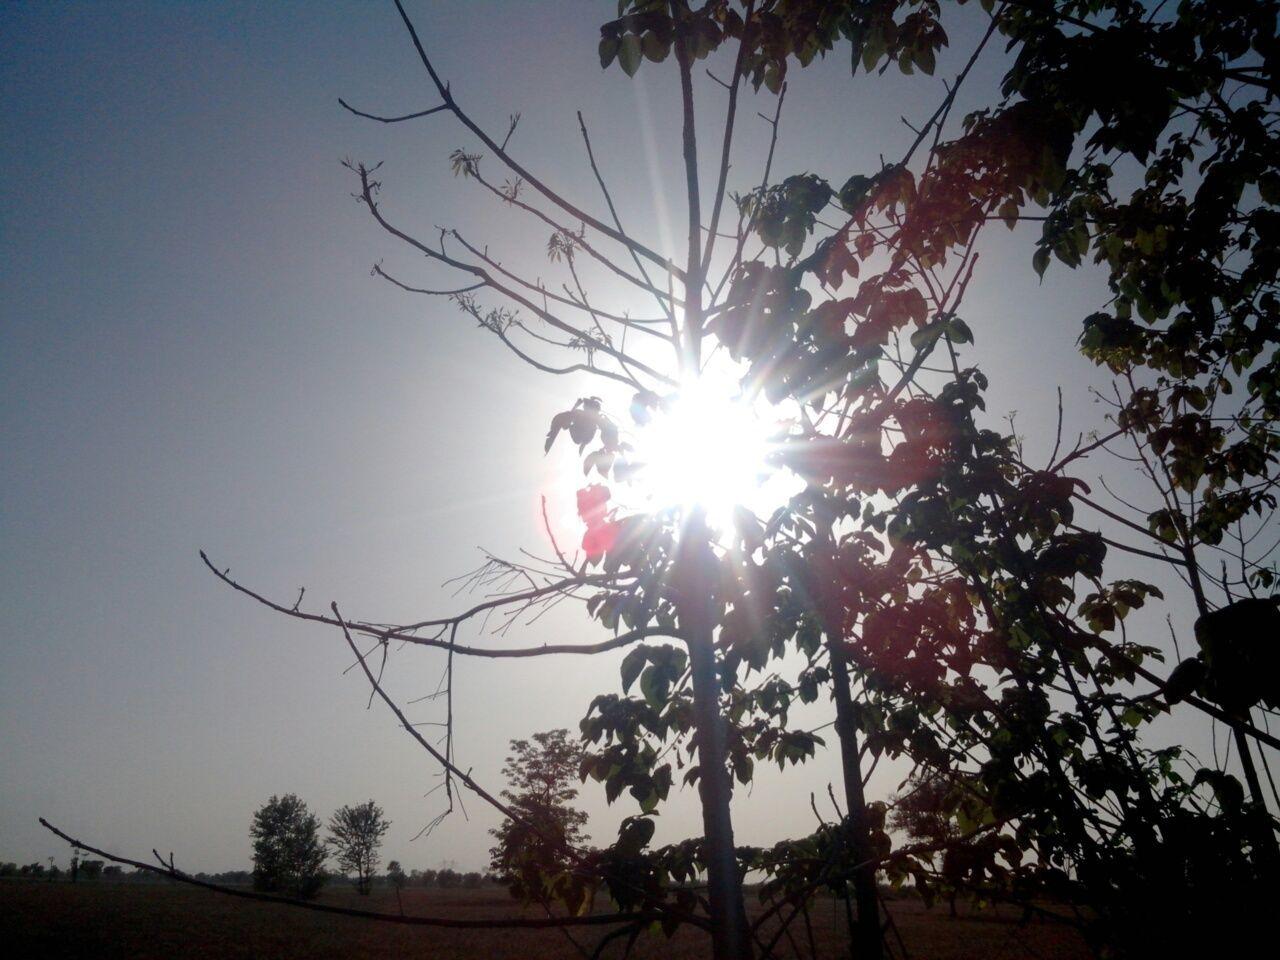 Sunset #sun #clouds #skylovers #sky #nature #beautifulinnature #naturalbeauty #photography #landscape Sunsky Trees Beauty Of Pakistan Nature EyeEm Nature Lover Sun Going Down